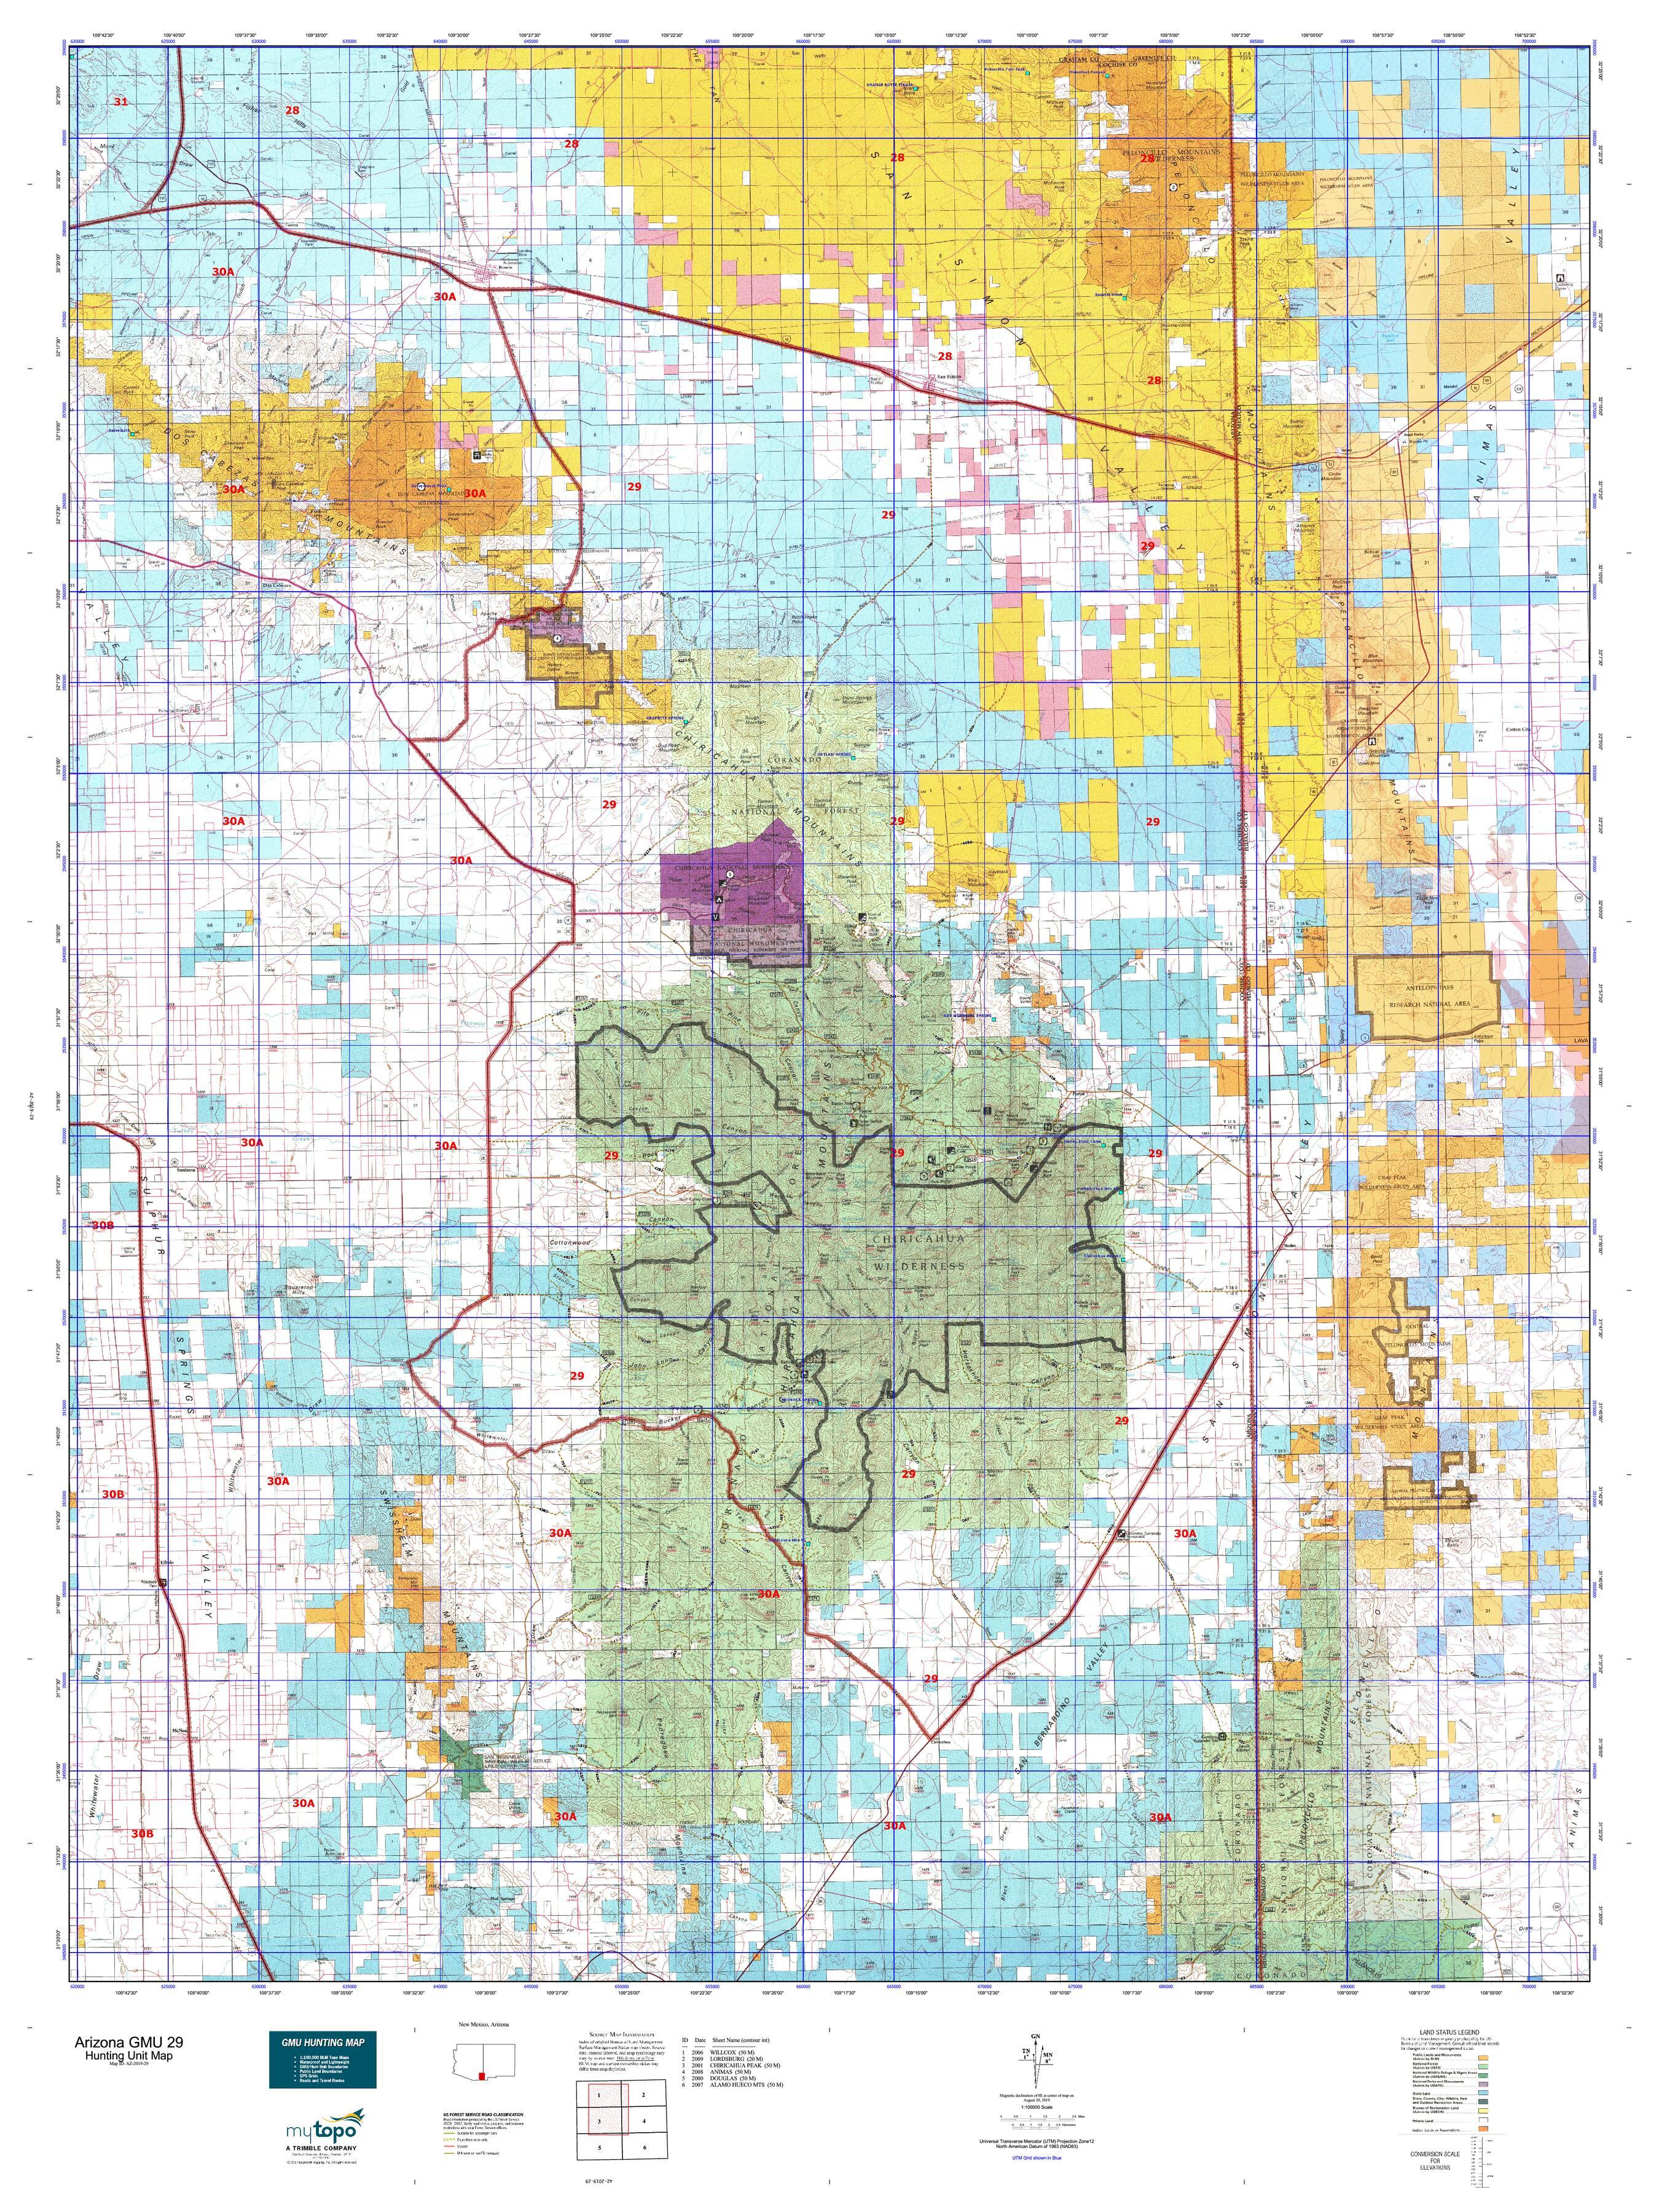 Arizona GMU 29 Map | MyTopo on nc map, ms map, ks map, mo map, mn map, arizona hwy map, arizona fun map, nv map, ma map, new mexico map, southern desert map, arizona wildlife map, ut map, or map, ae map, kr map, iowa map, wy map, ok map, arizona road map,